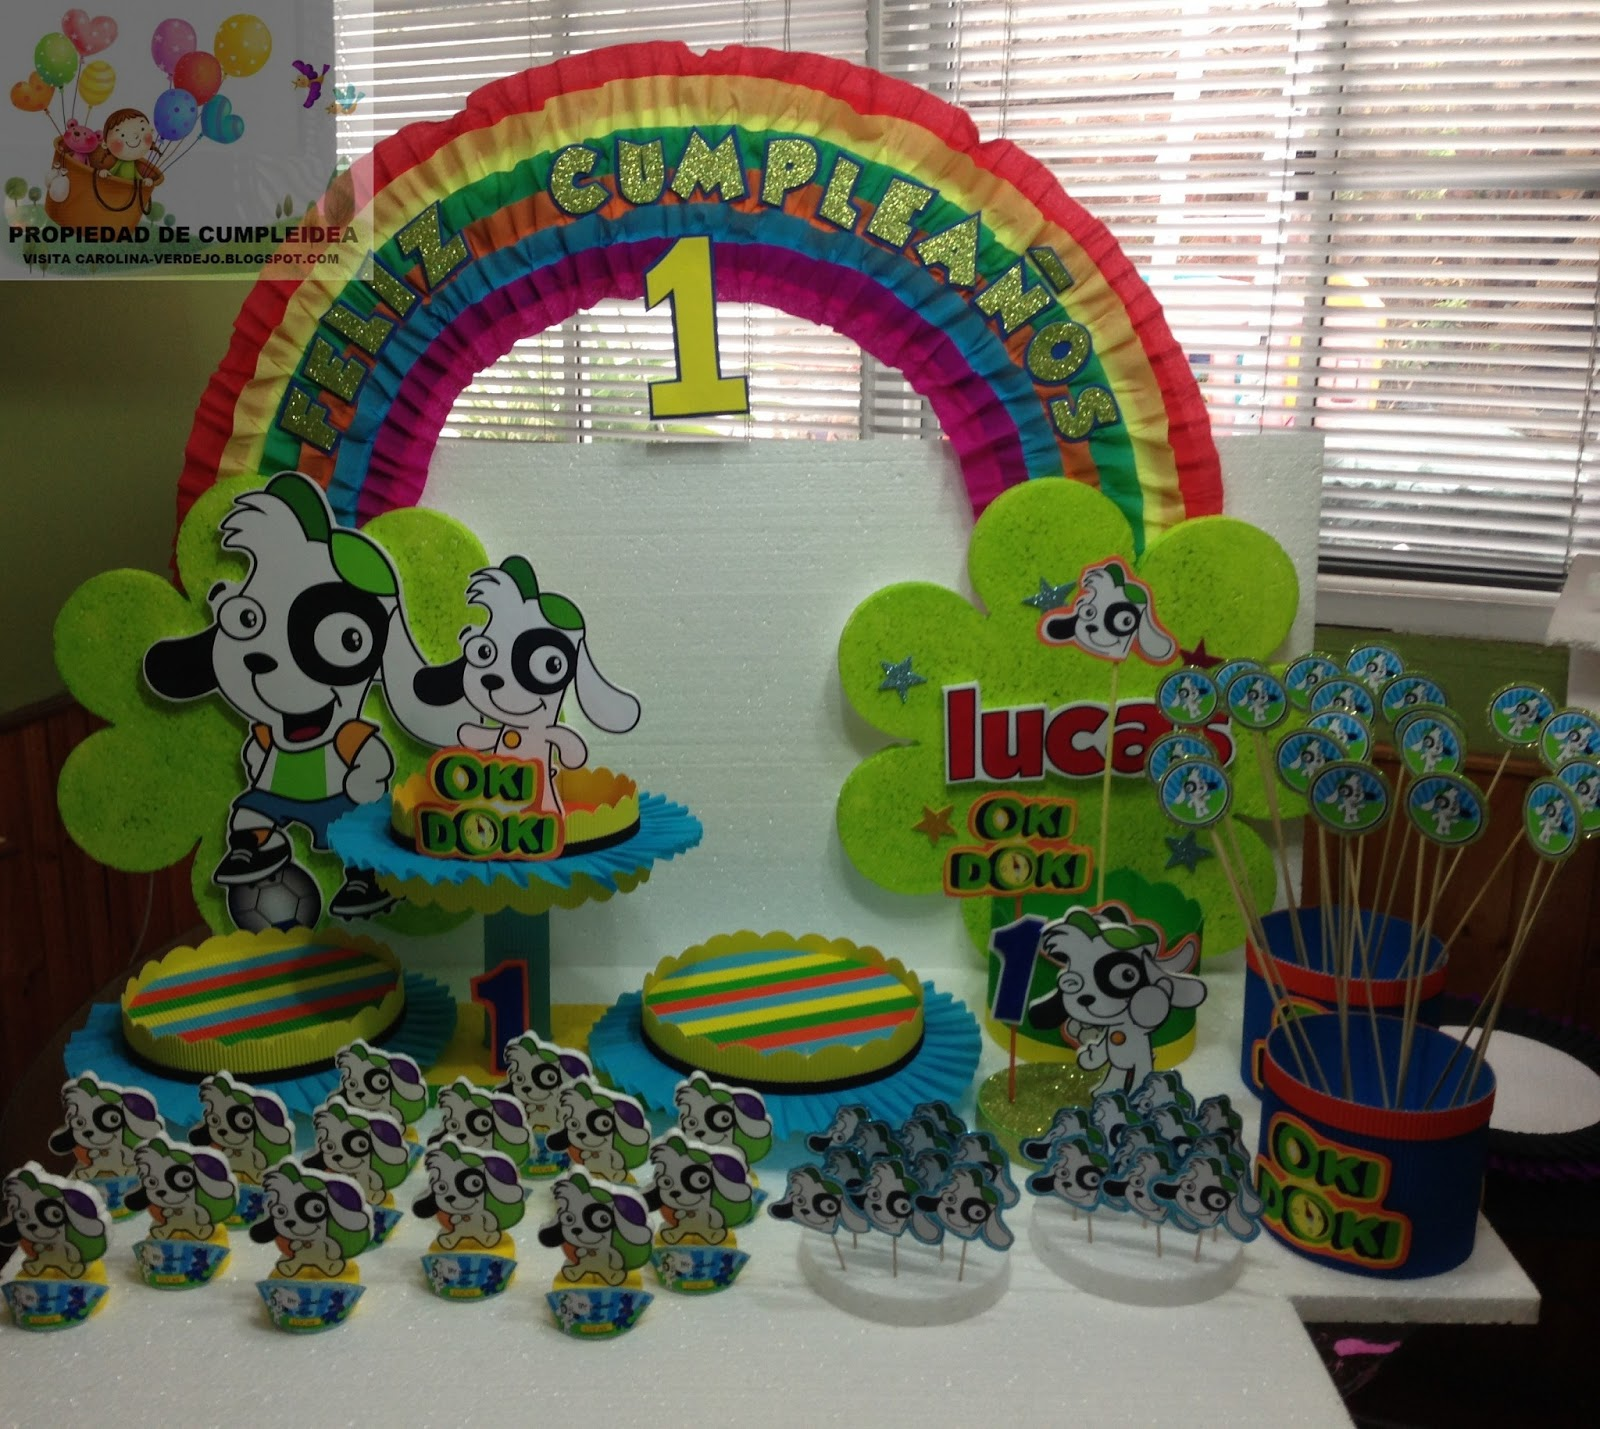 Decoraciones infantiles doki for Decoraciones infantiles